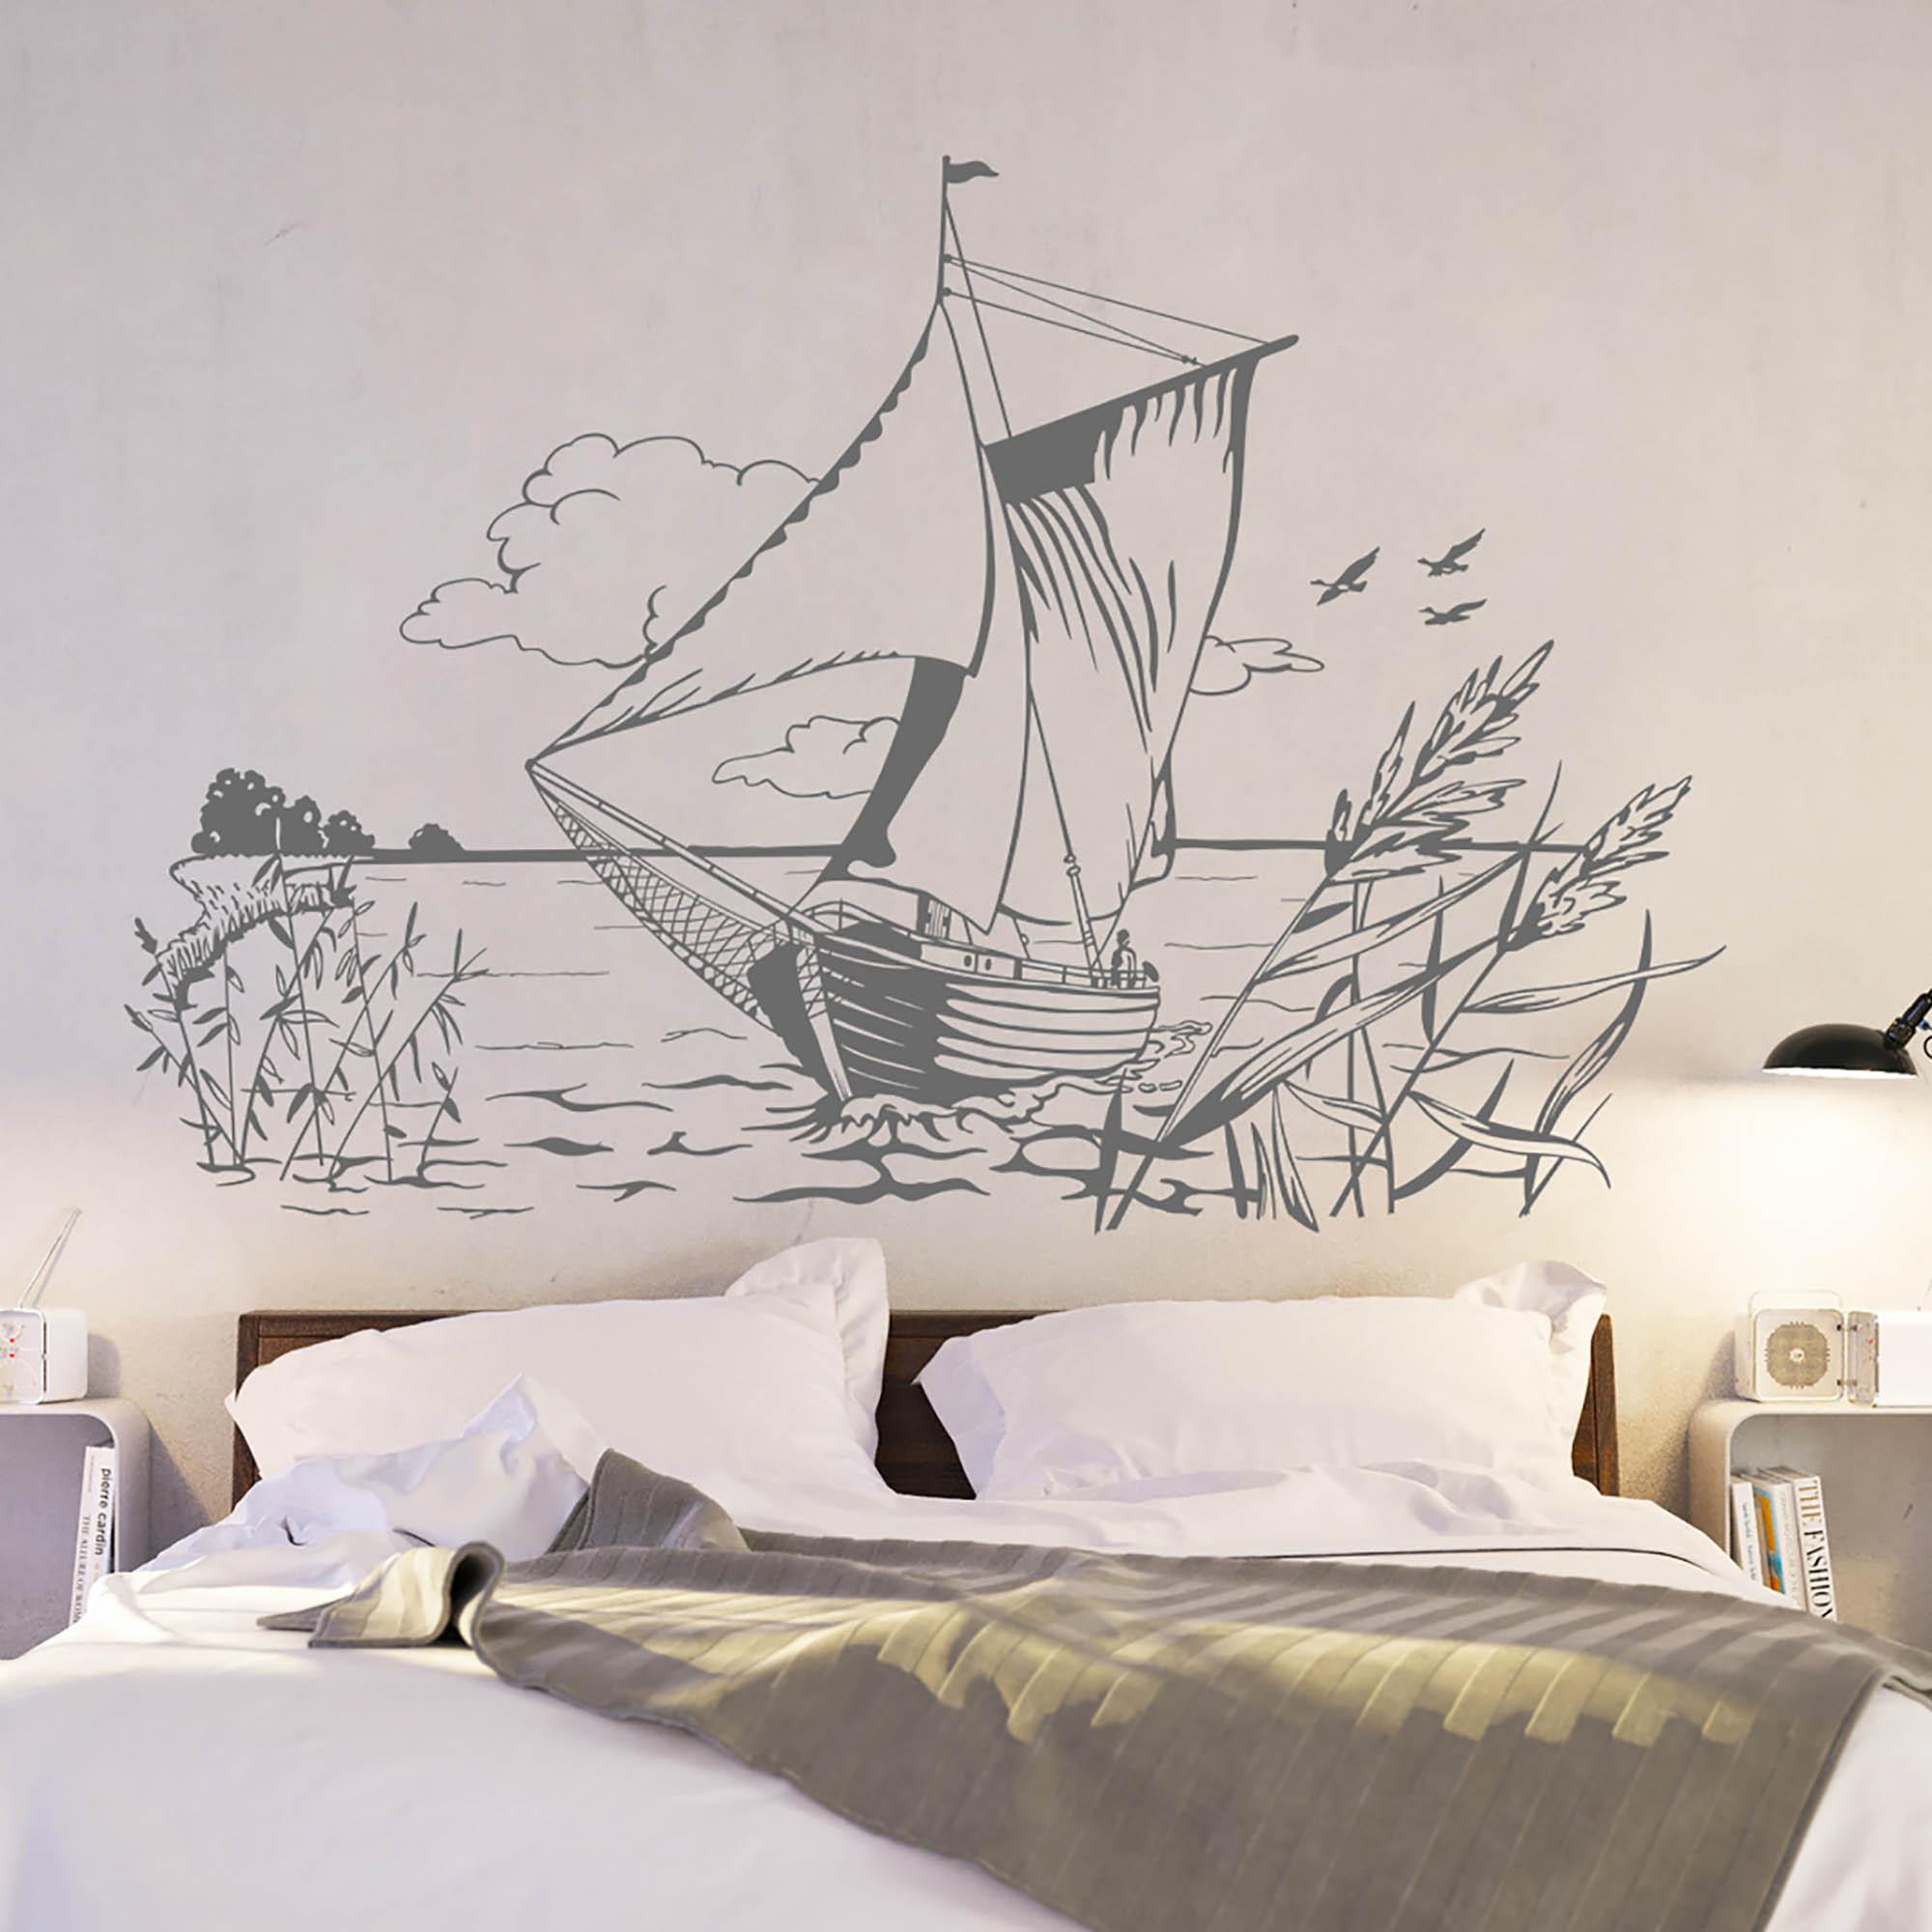 wandtattoo zeese zeesenboot schiff segler k ste meer schilf m1451 wandtattoos elfent r tassen. Black Bedroom Furniture Sets. Home Design Ideas